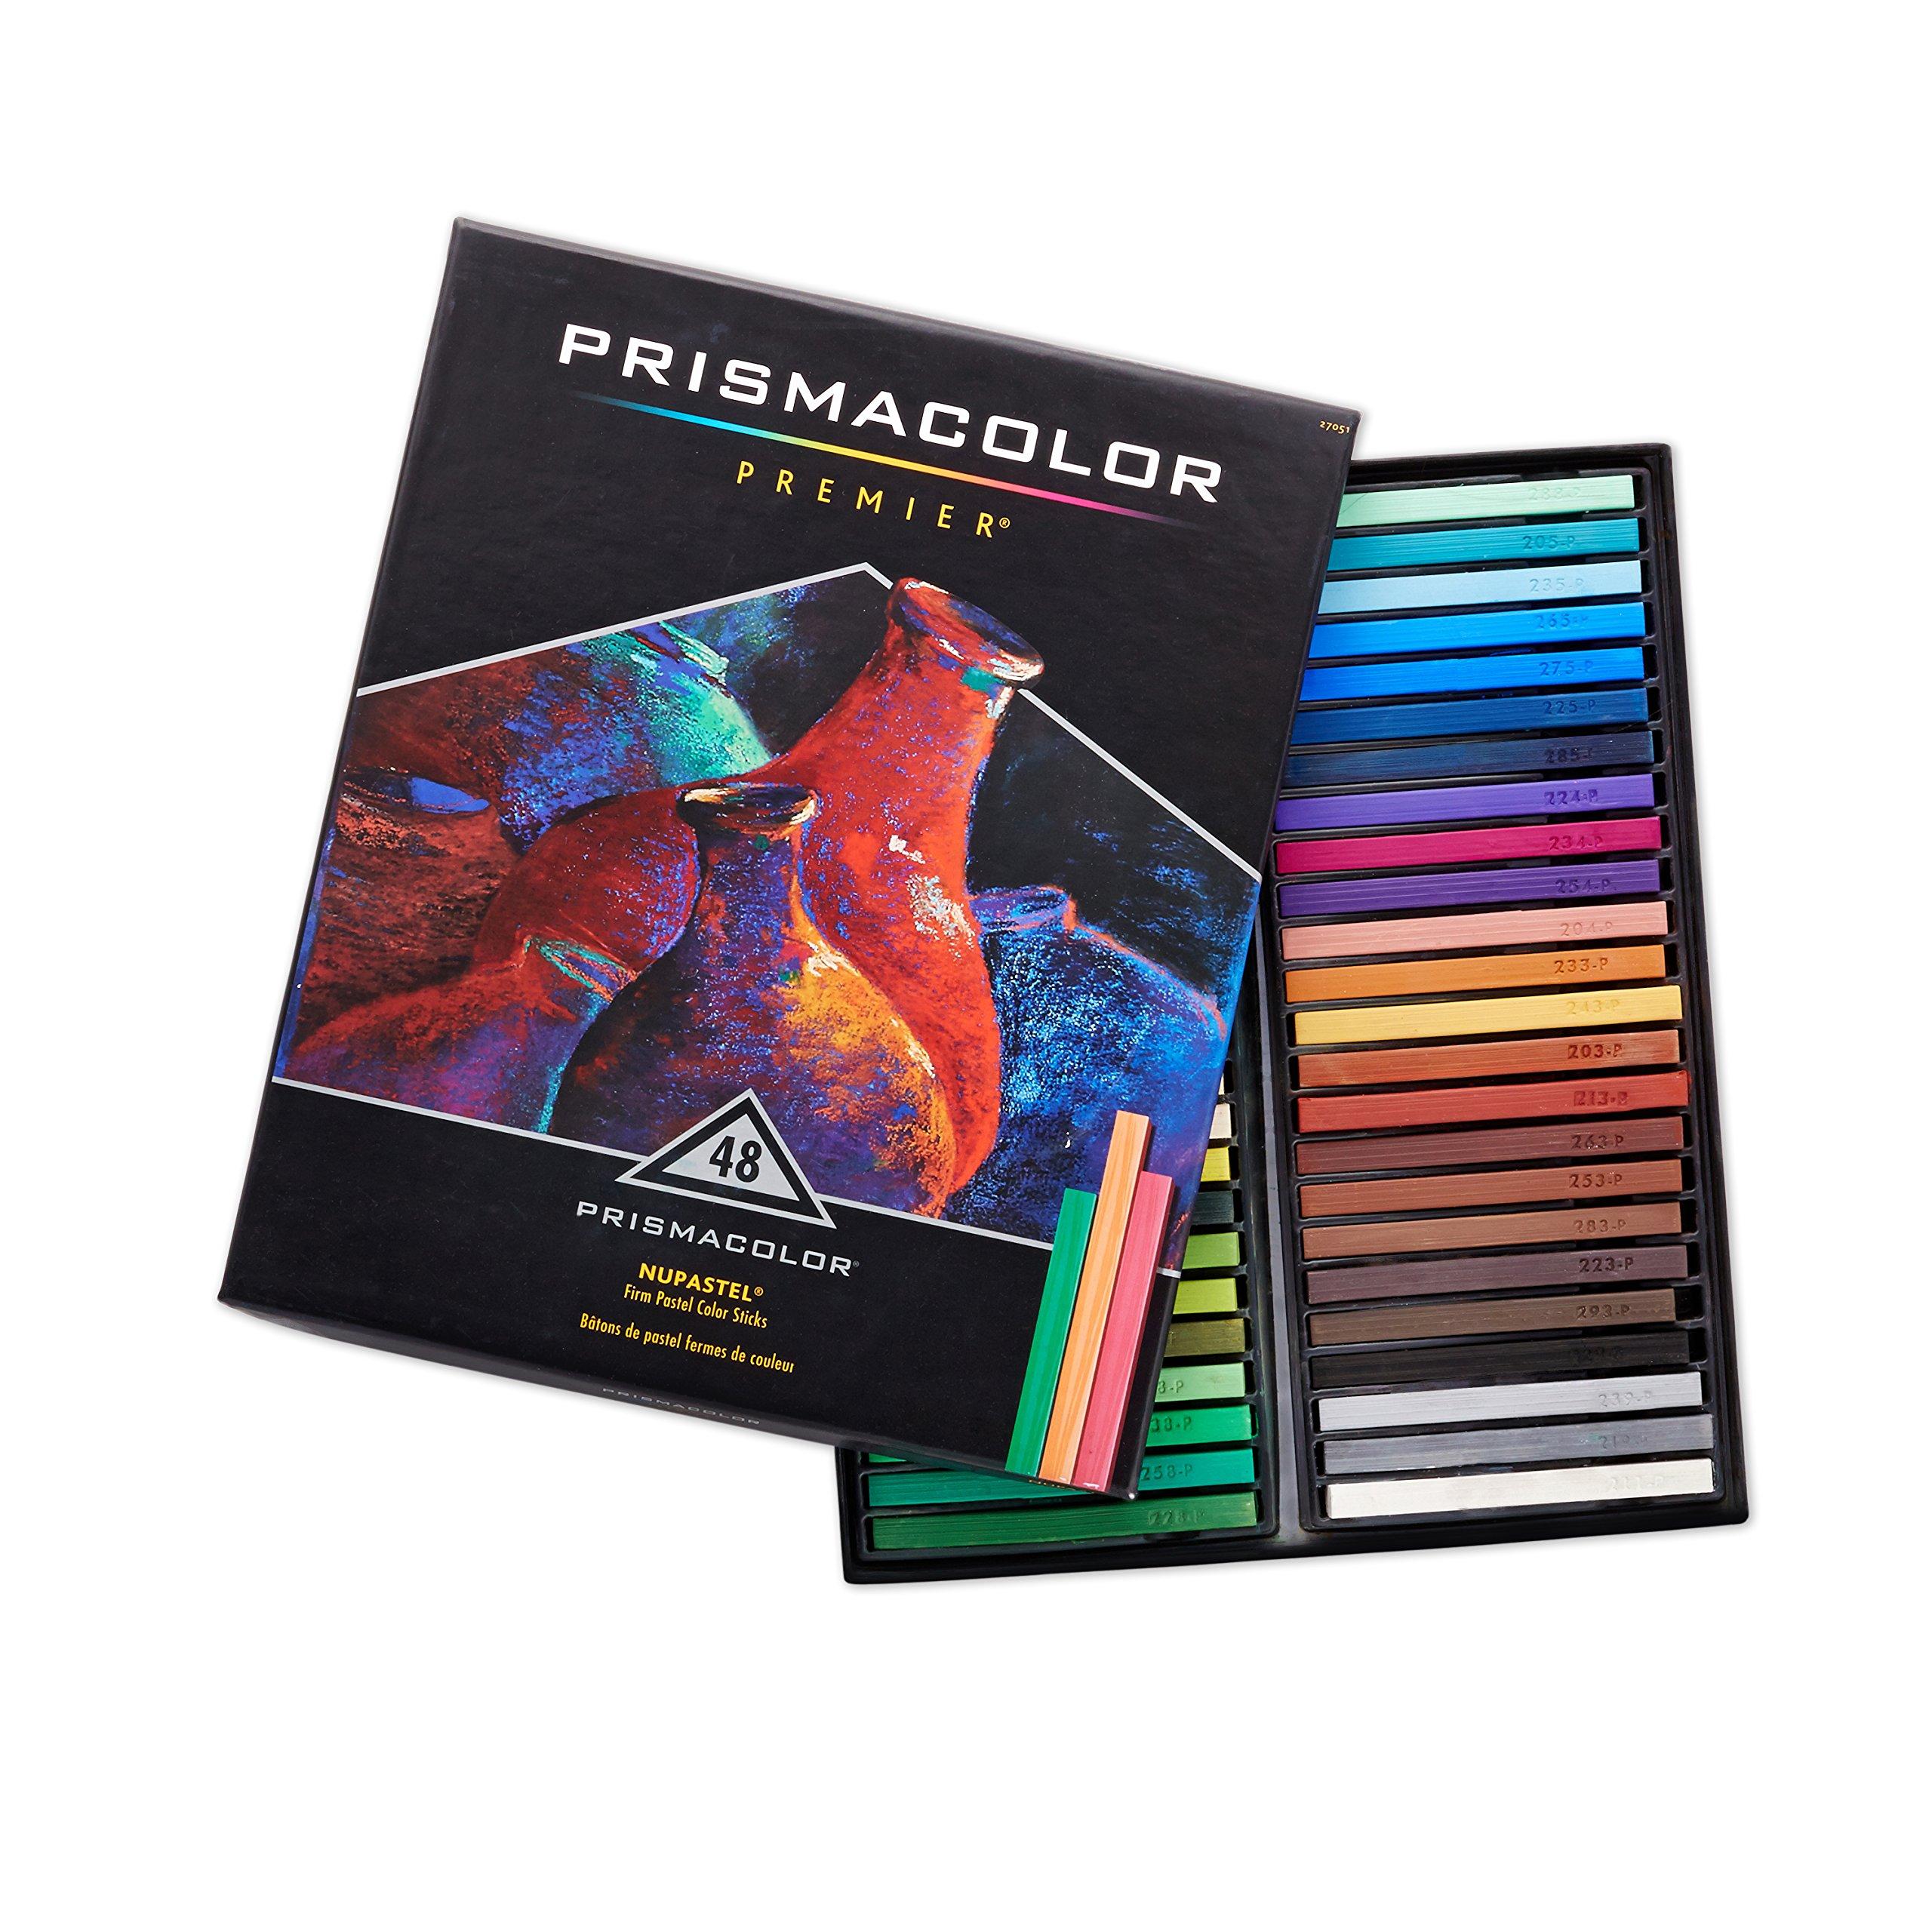 Prismacolor 27051 Premier NuPastel Firm Pastel Color Sticks, Box of 48 Color Sticks by Prismacolor